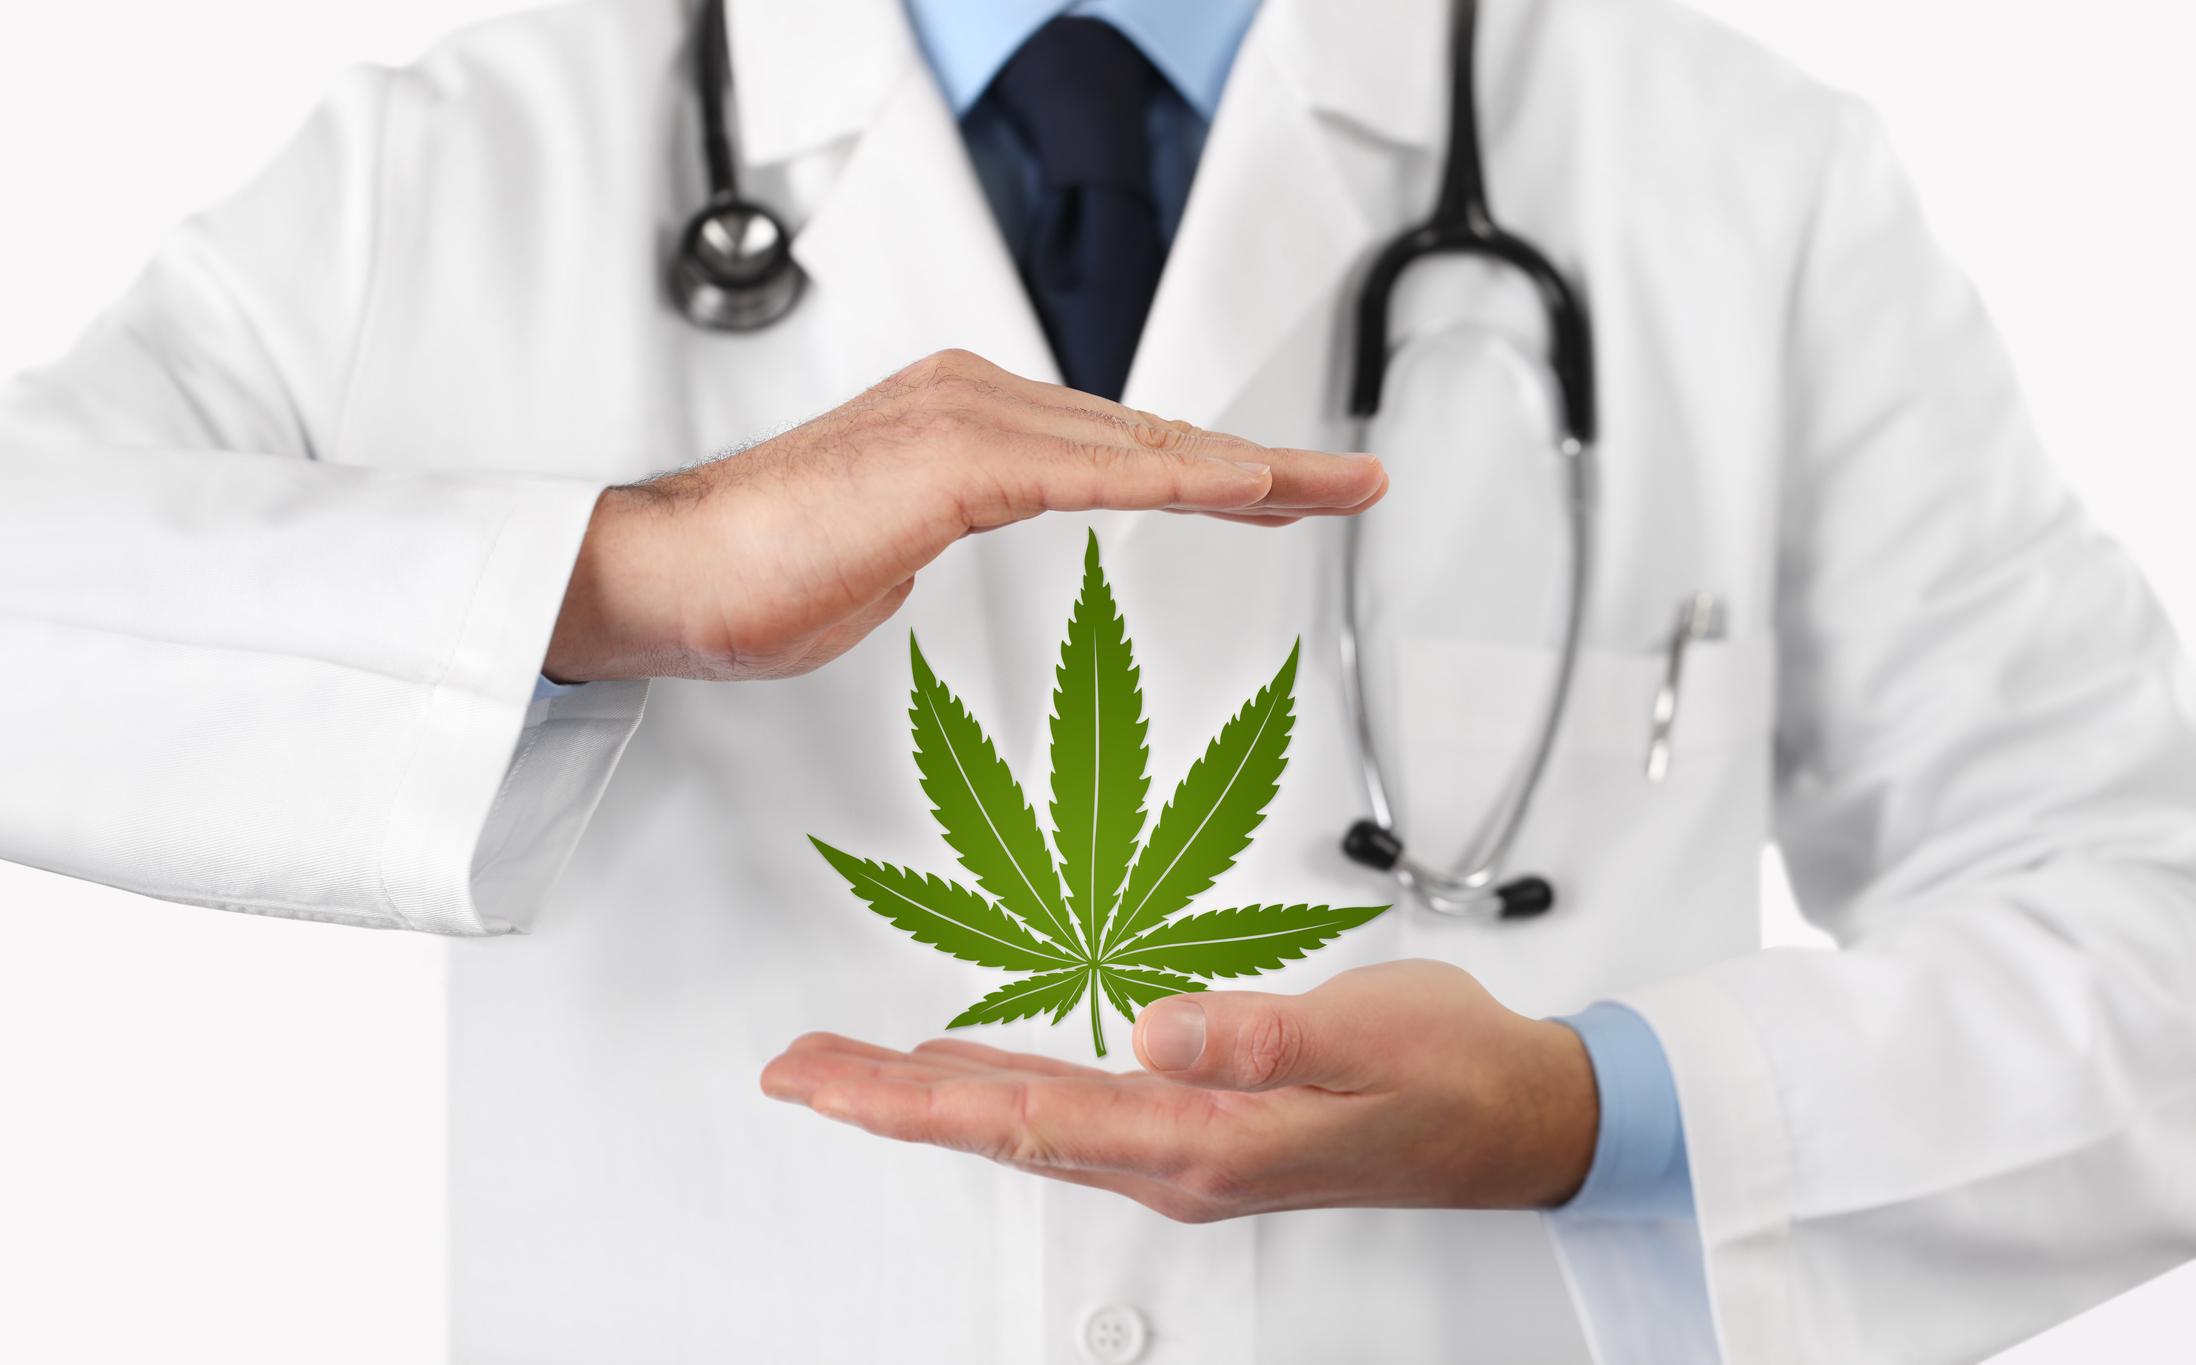 A physician holding a cannabis leaf.